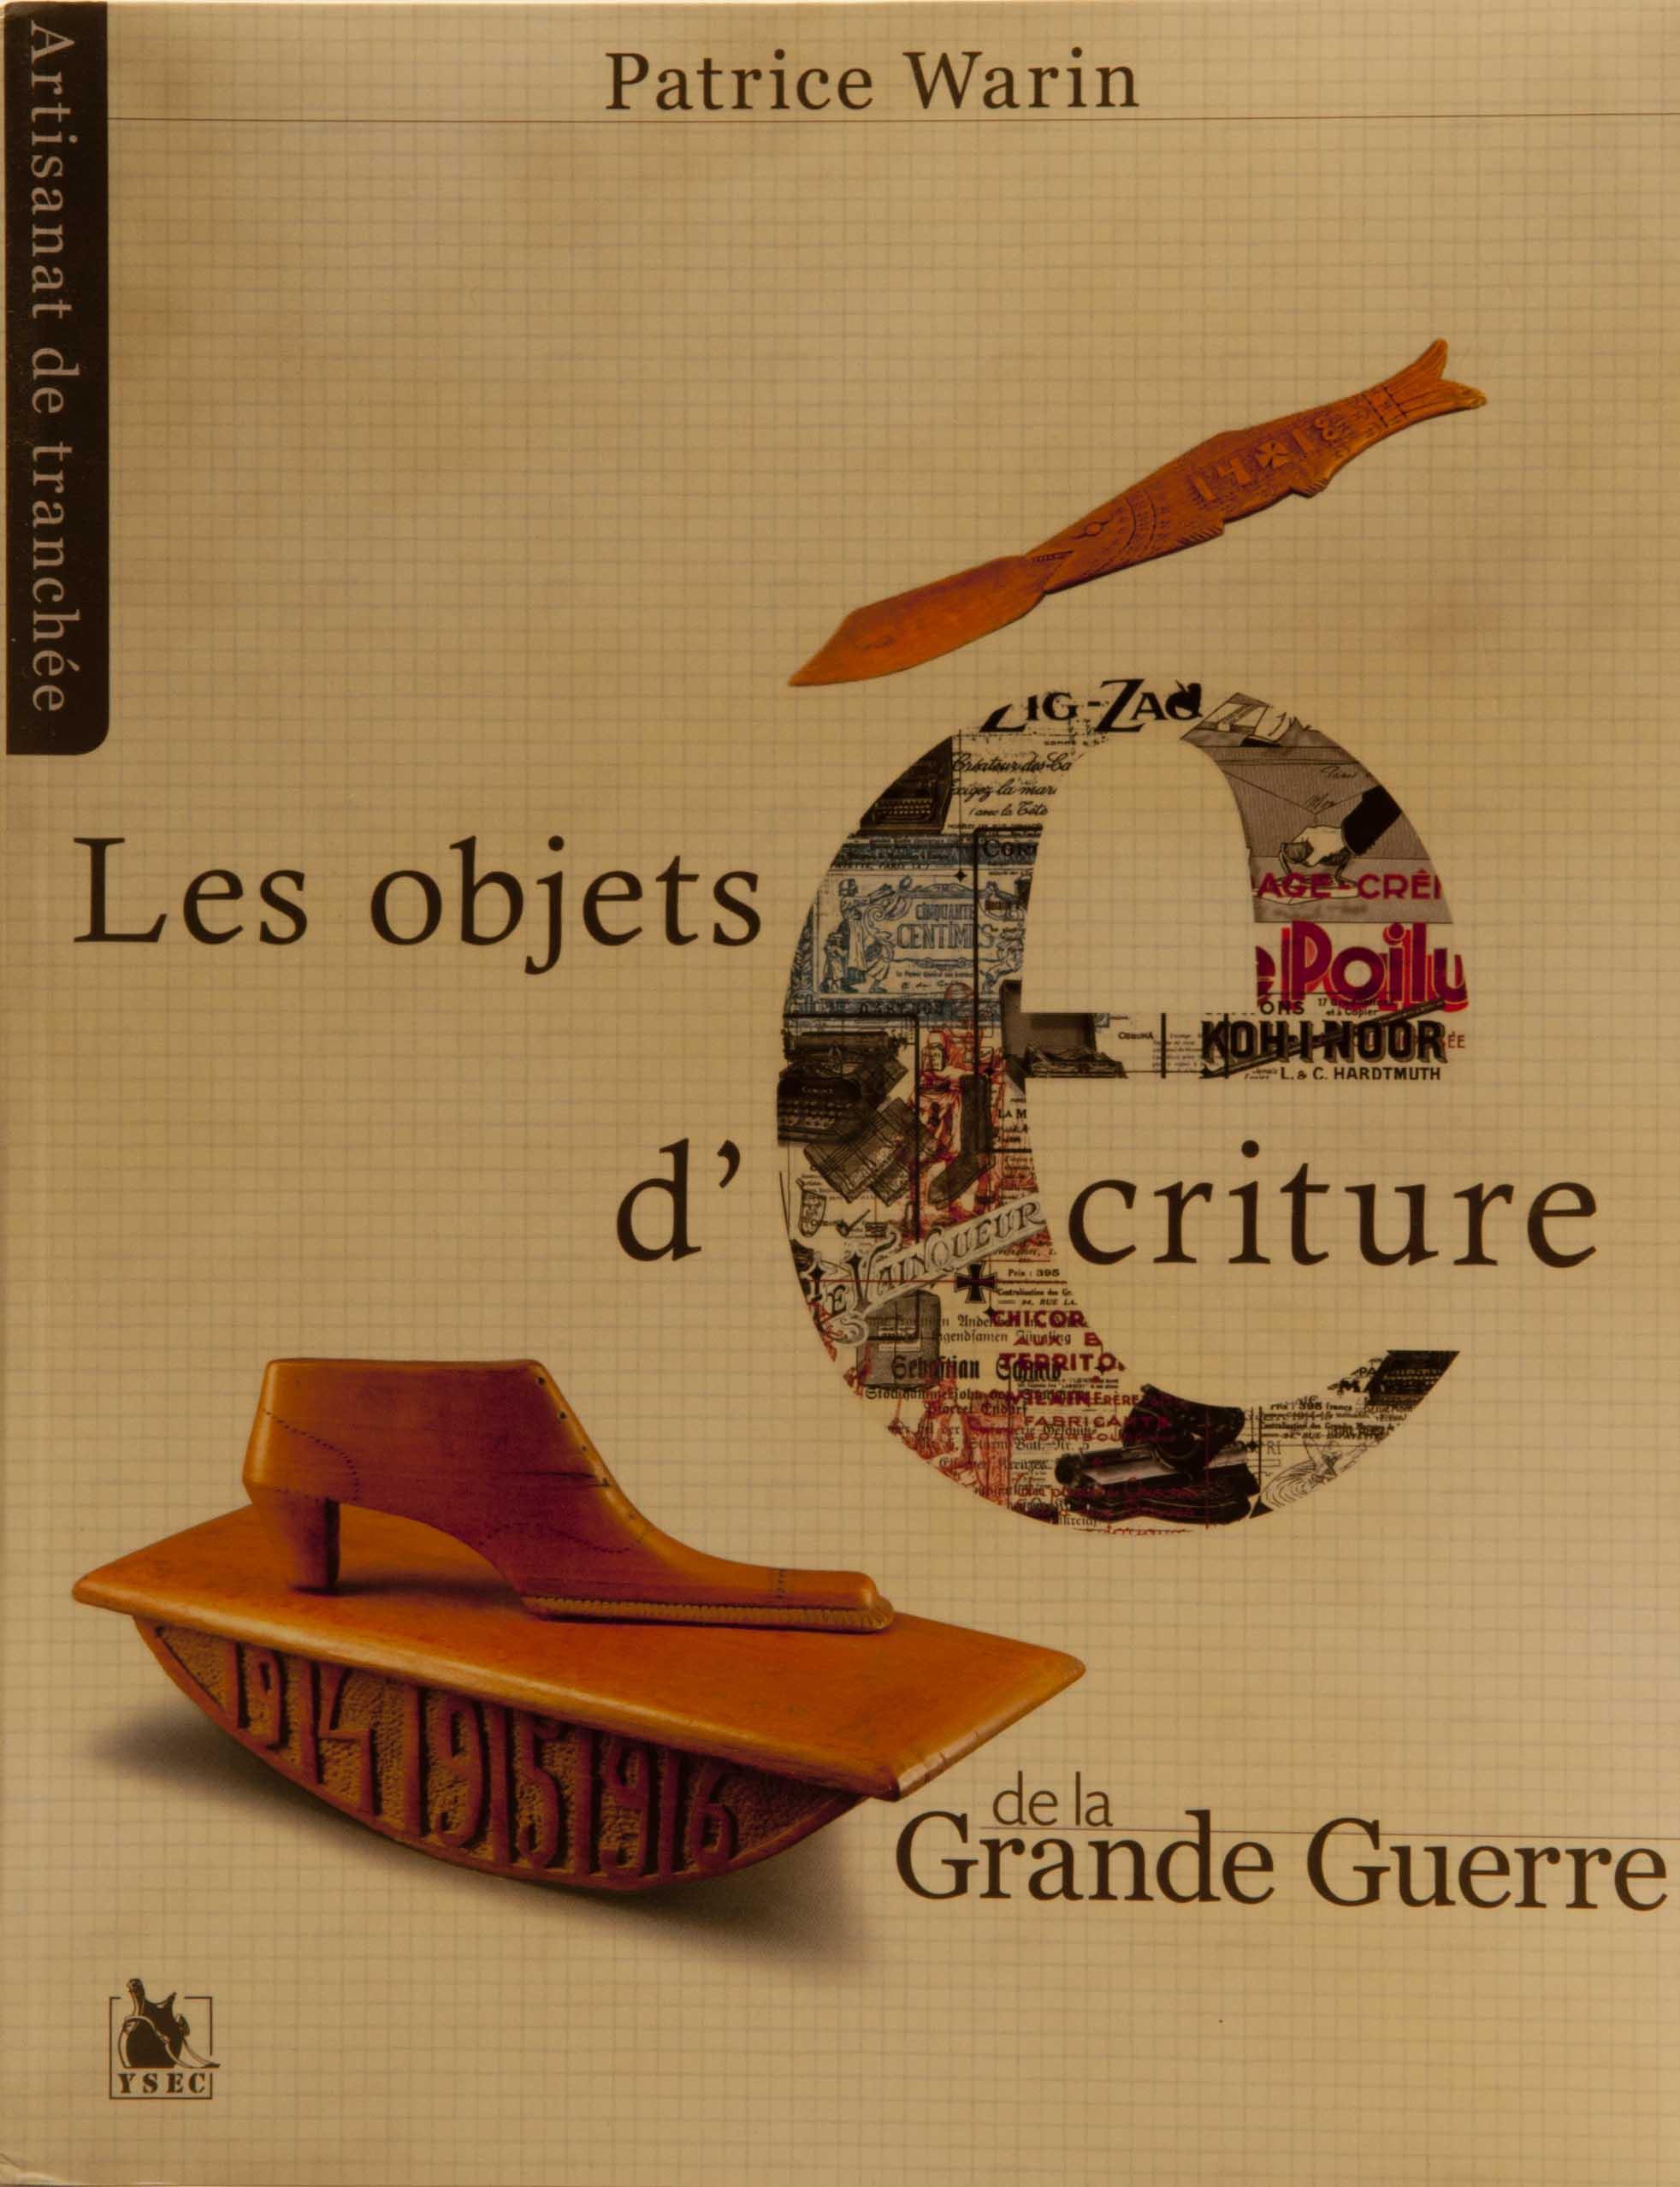 Les Objects D'e Criture de la Grande Guerre By Patrice Warin .jpg